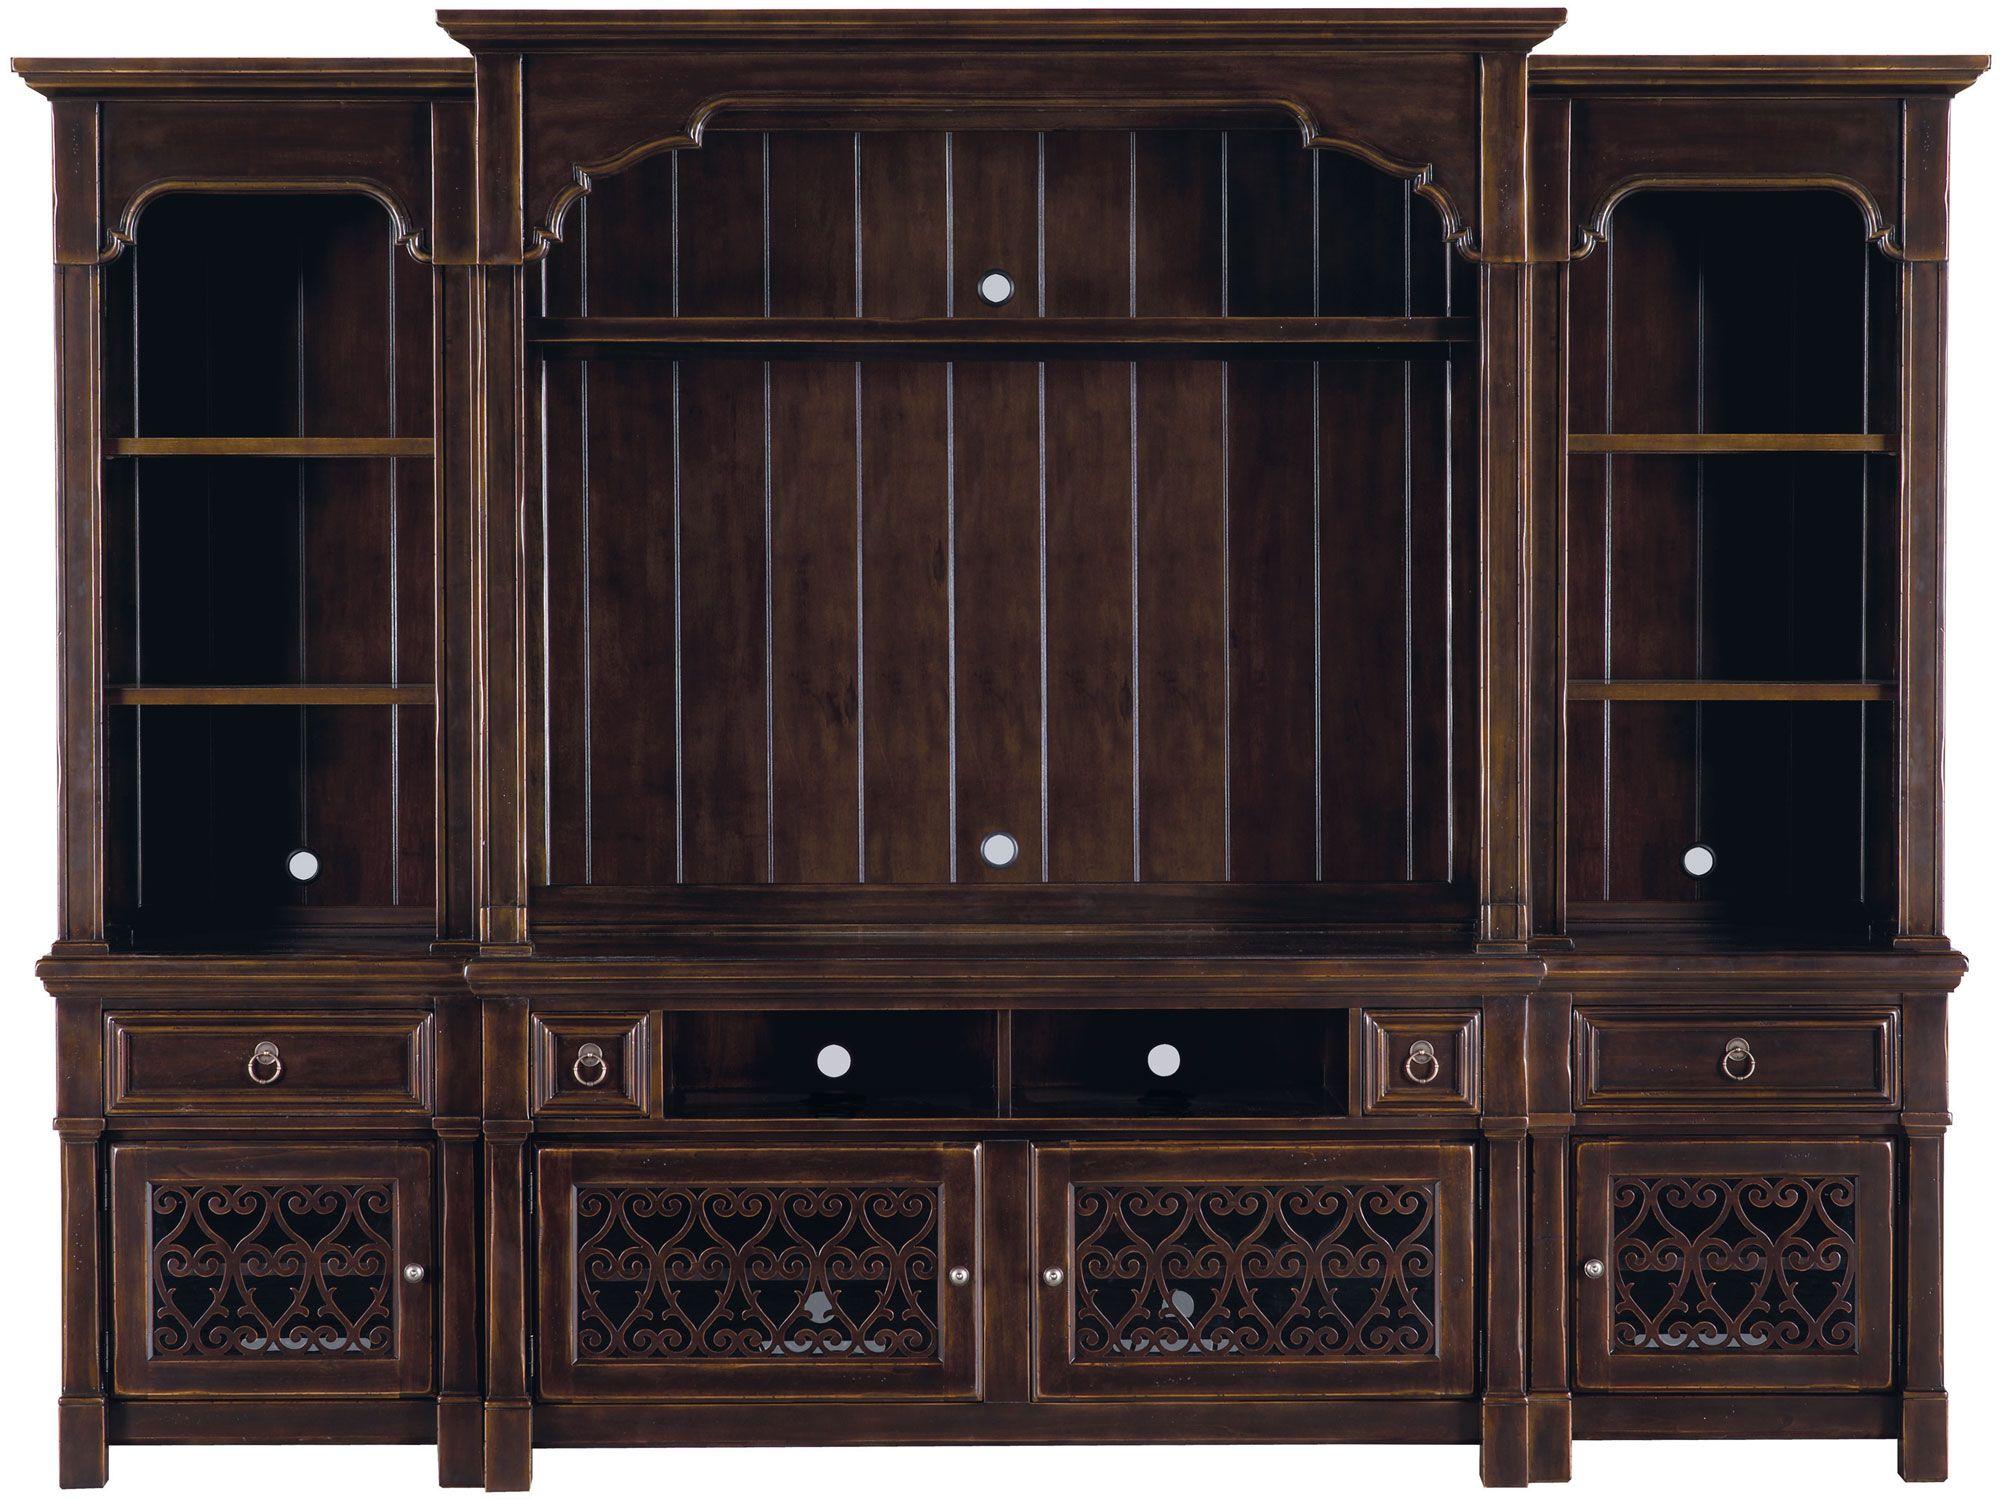 Cheap legends furniture cambridge fireplace media center in cherry - Entertainment Console Deck With Pier Units Bernhardt